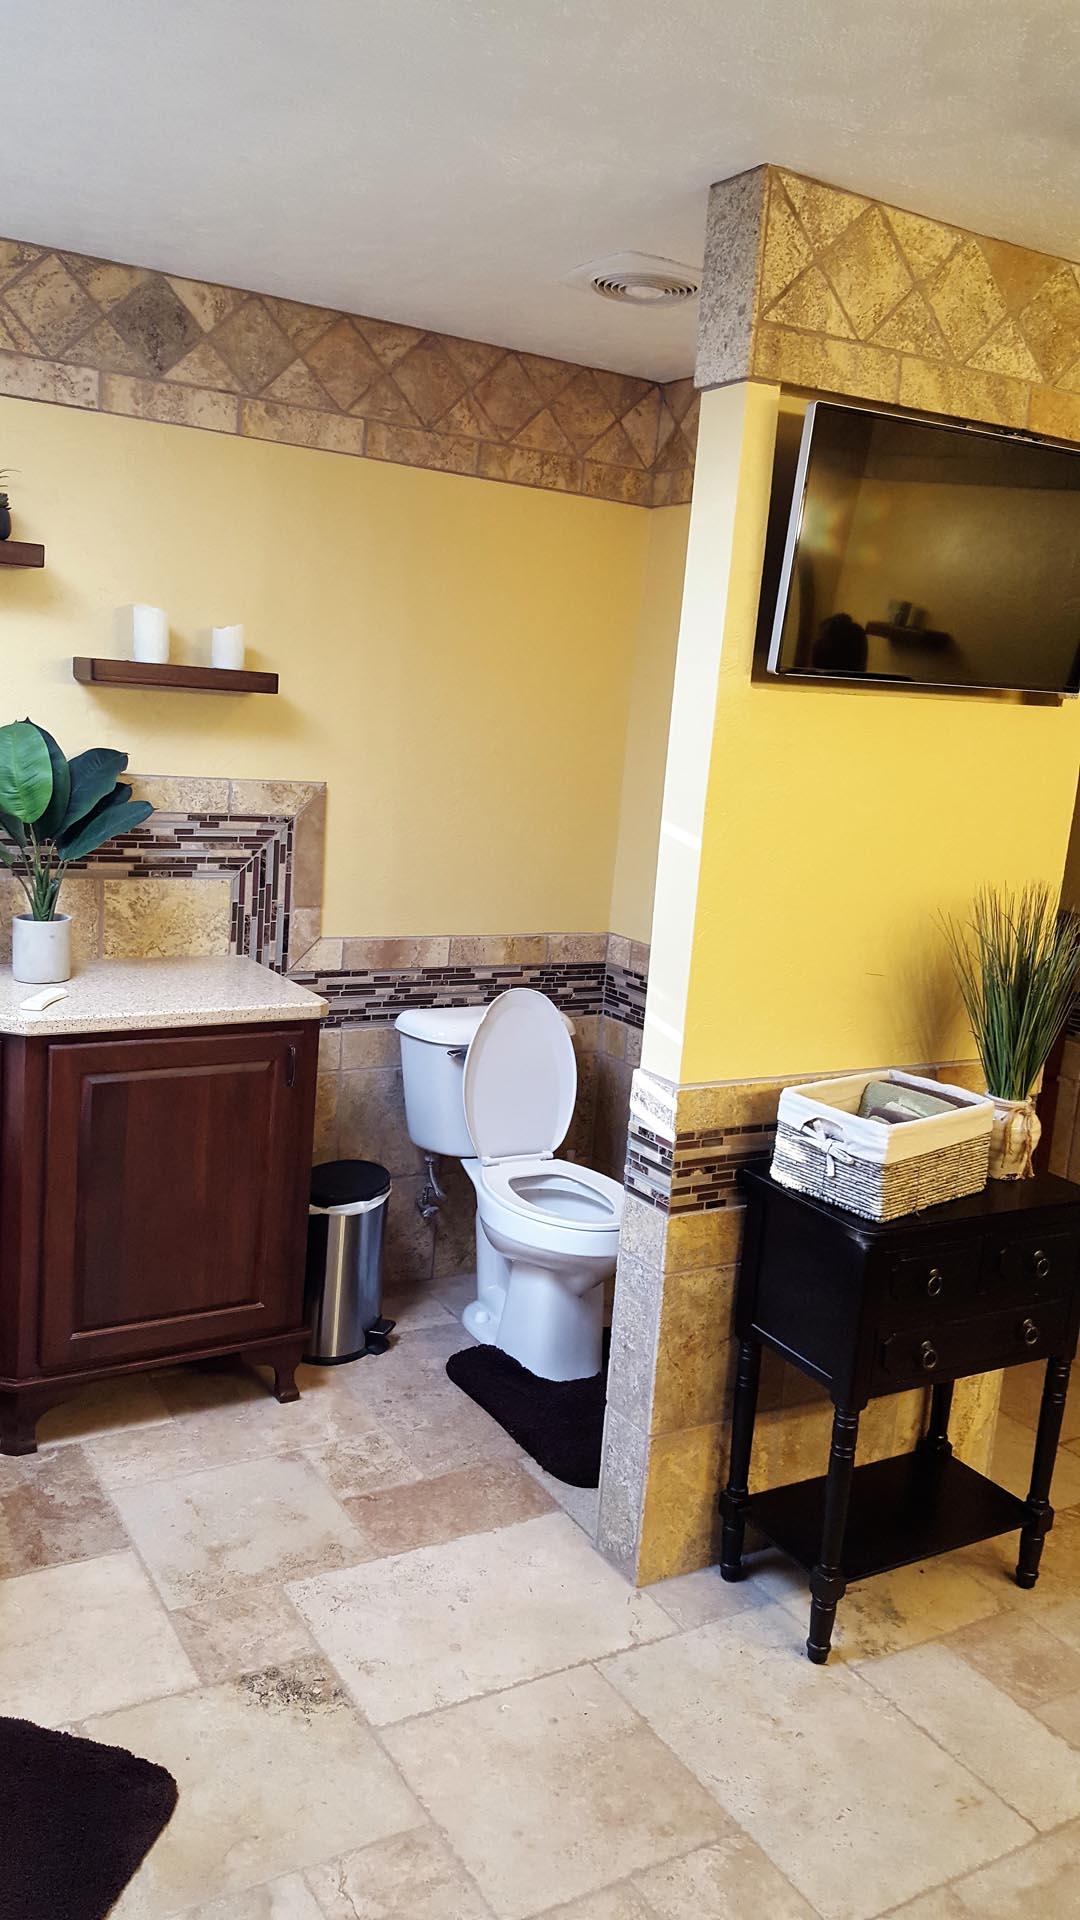 Bathroom Remodeling Lawton Ok Landoll Construction